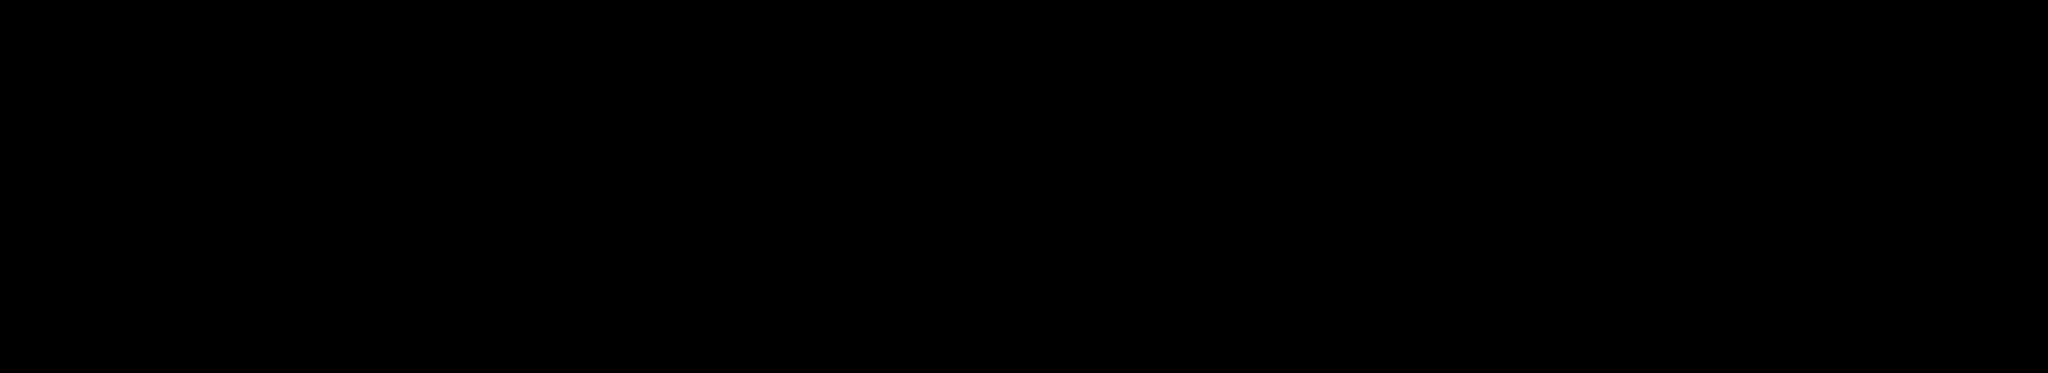 UN18-06